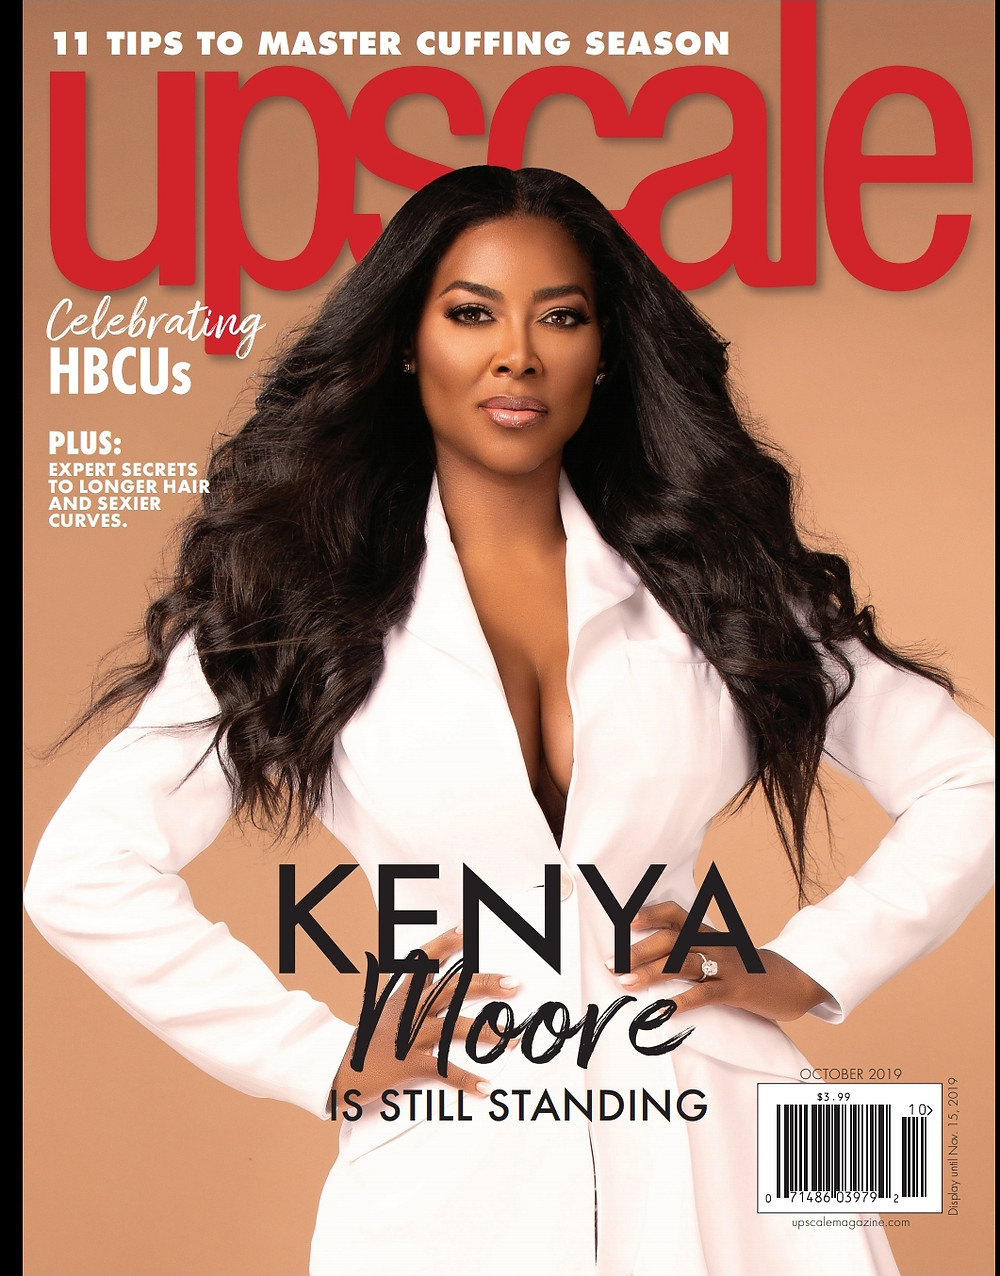 October 2019 issue